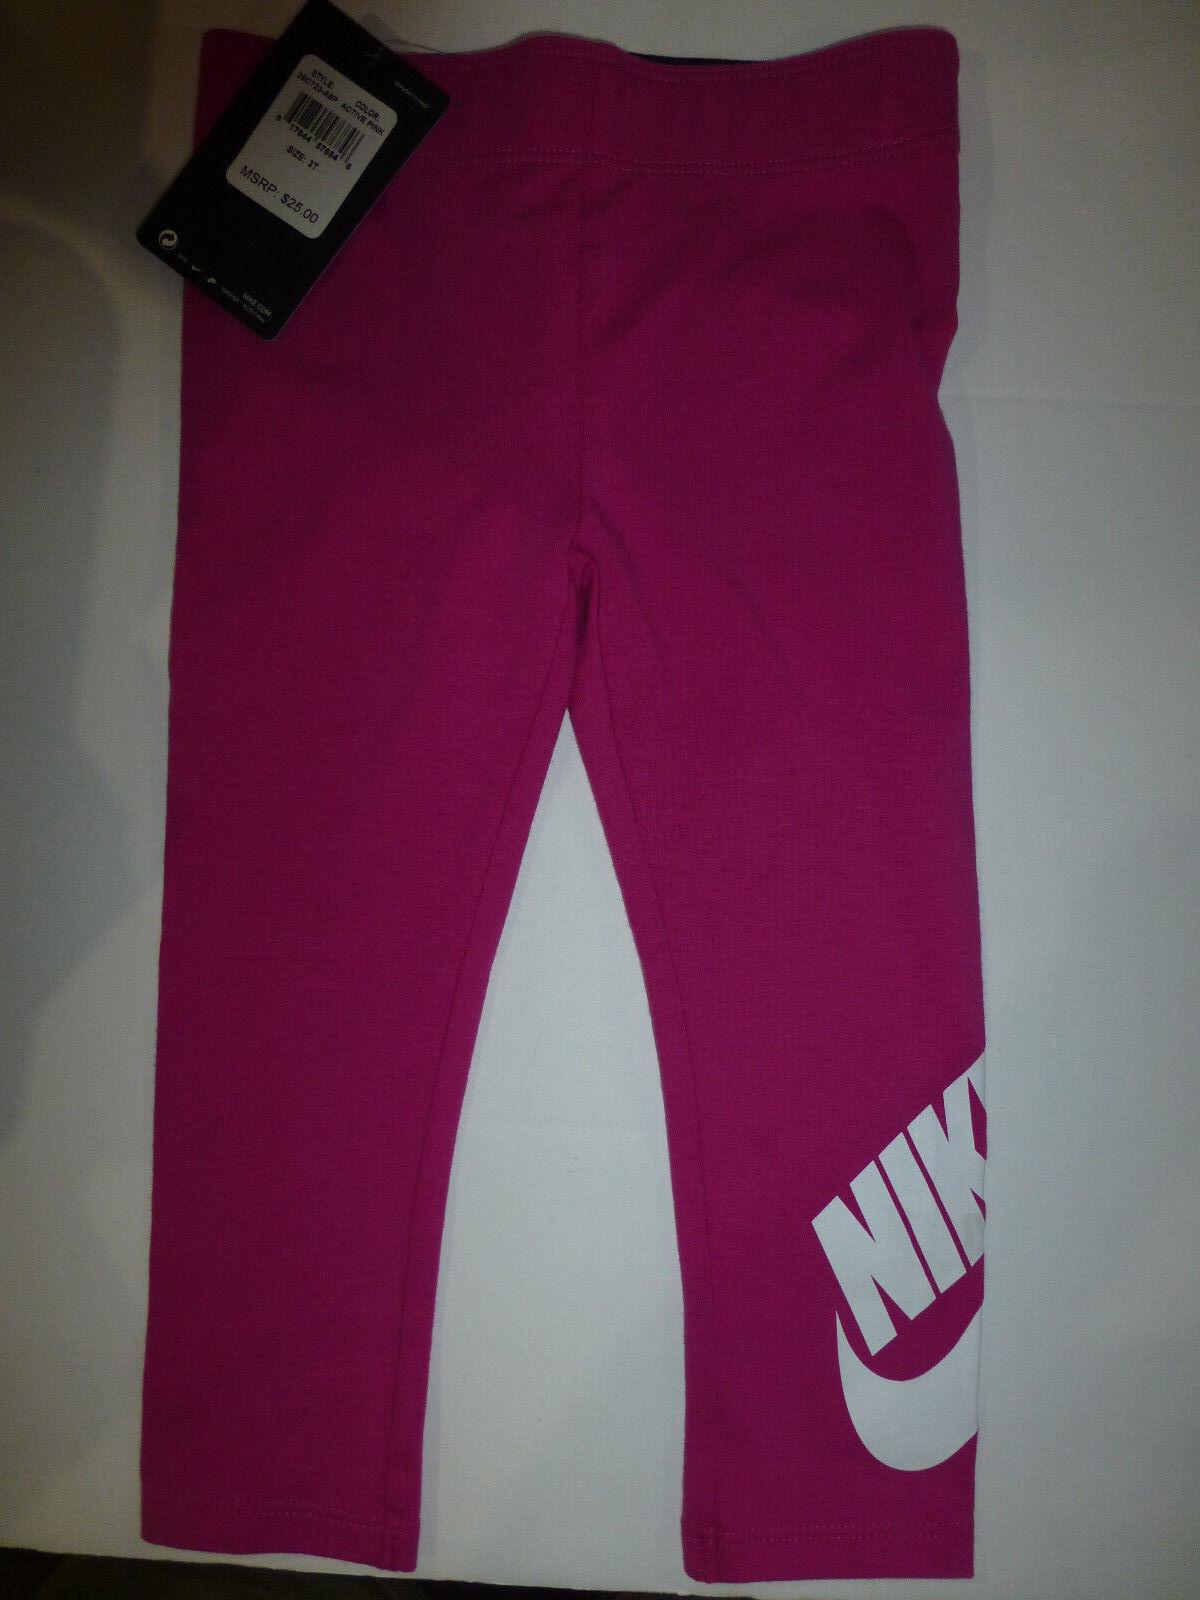 Nike Little Girls Active Pink Elastic Waist Leggings Pants 26C723 New 3T  for sale online